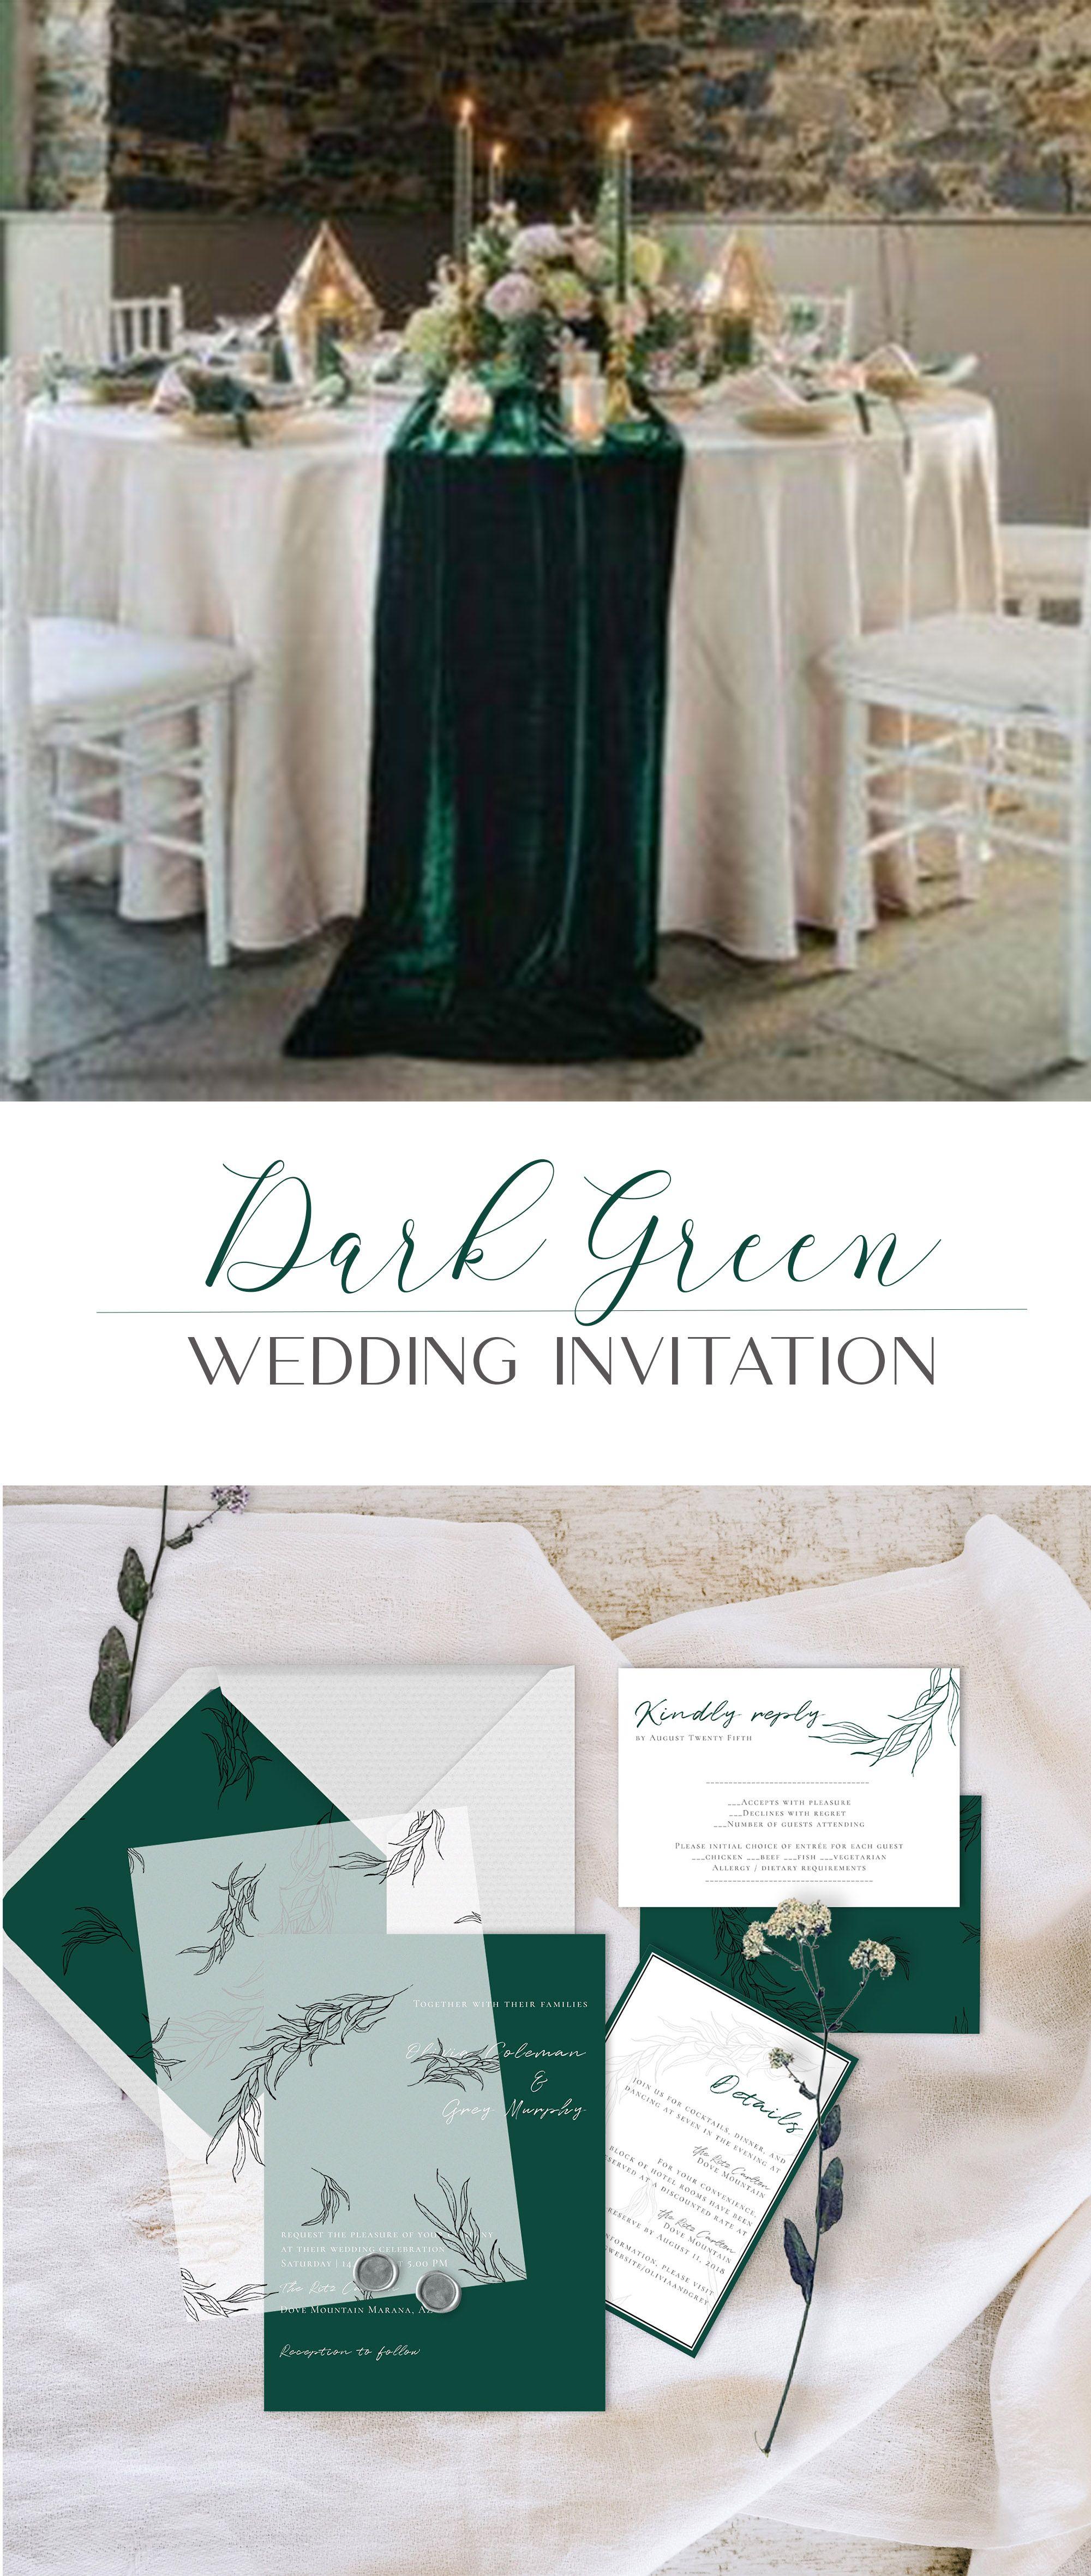 dark green wedding color theme  dark green wedding green